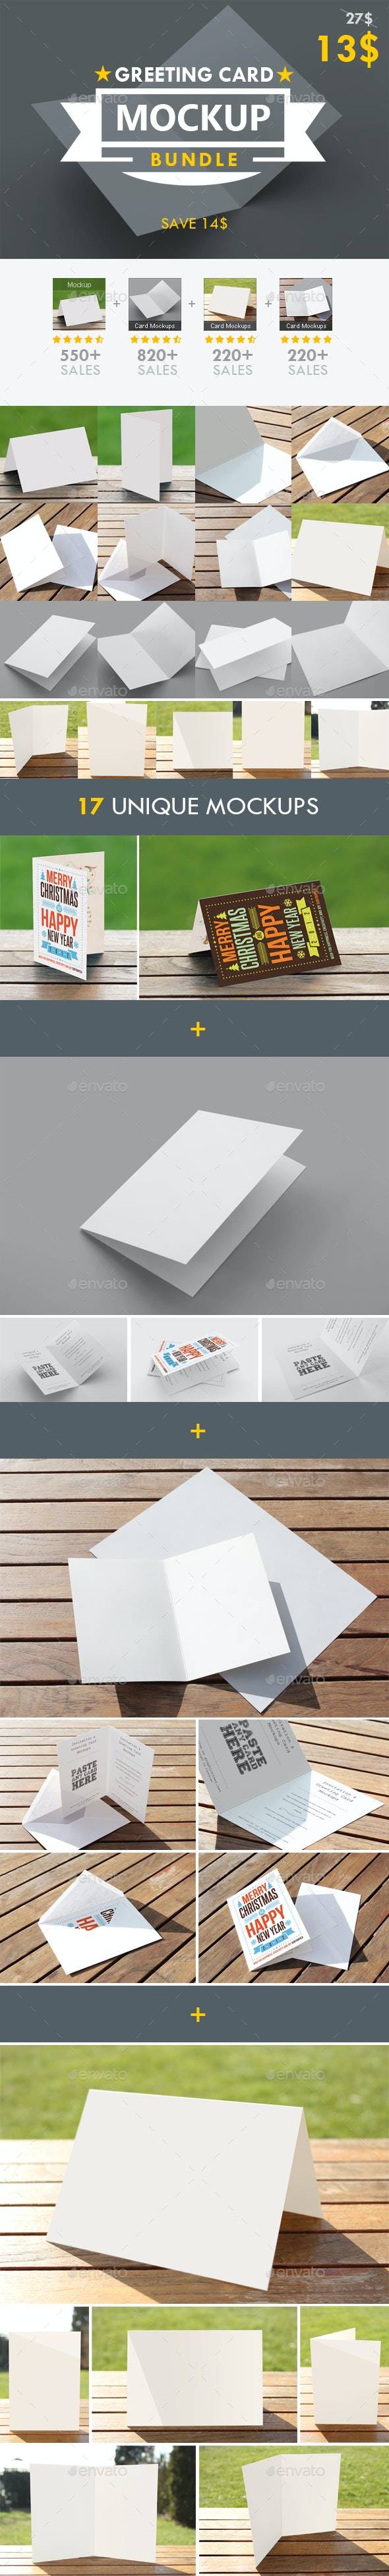 Greeting Card Mockup Bundle - Miscellaneous Print